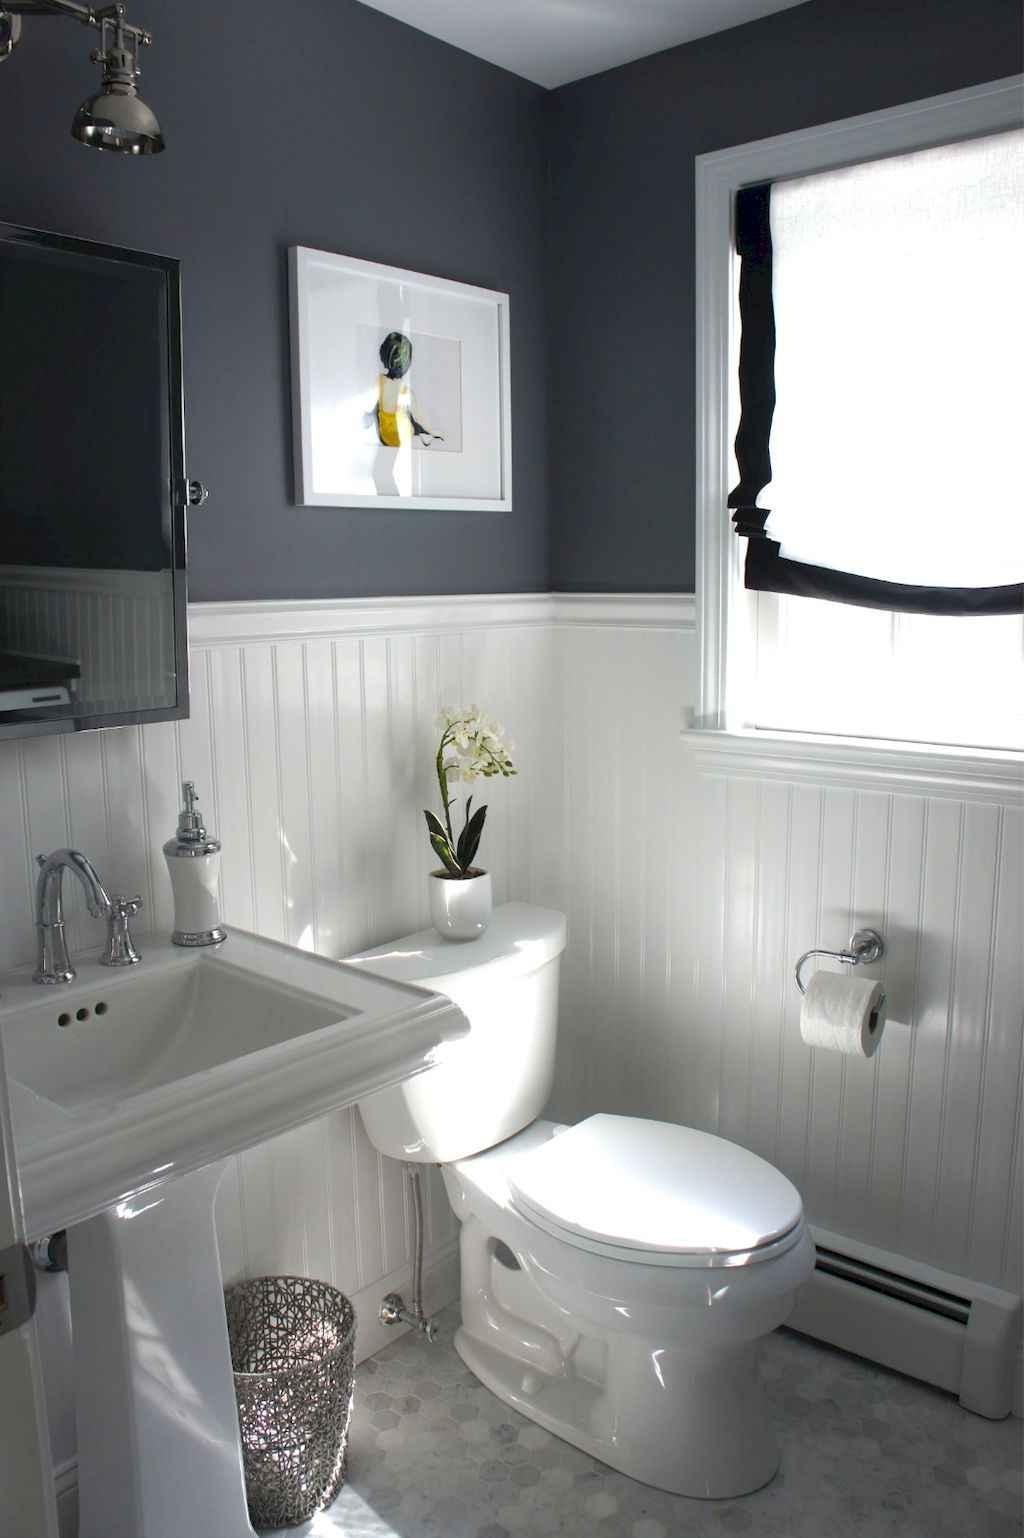 Inspiring apartment bathroom remodel ideas on a budget (37)